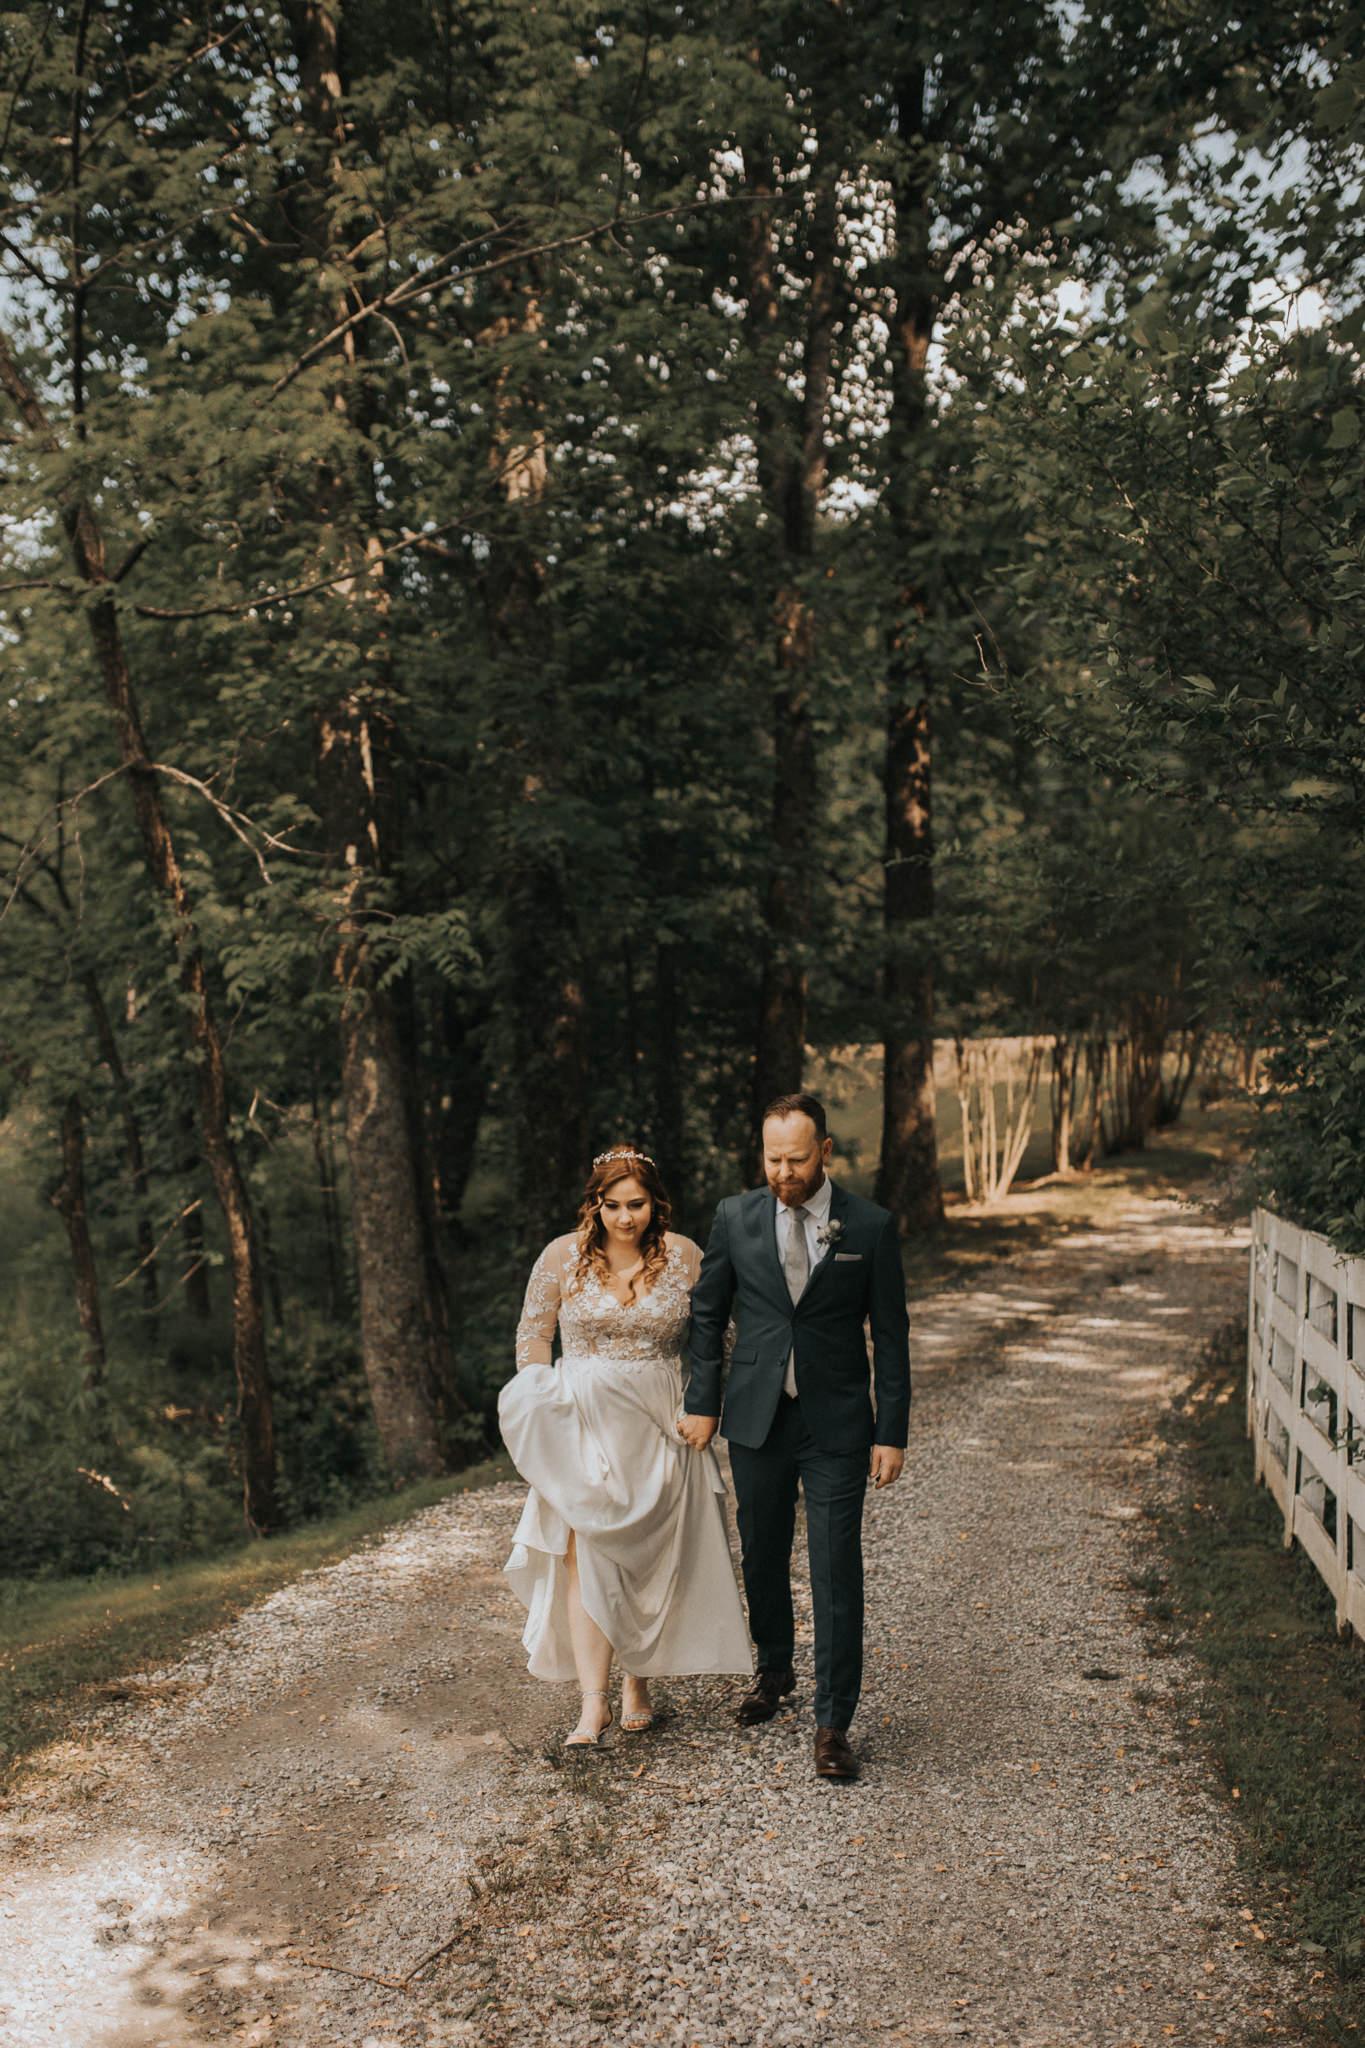 KateMatt-North-Georgia-Wedding-Photographer-Mountain-Laurel-Farm-46.jpg